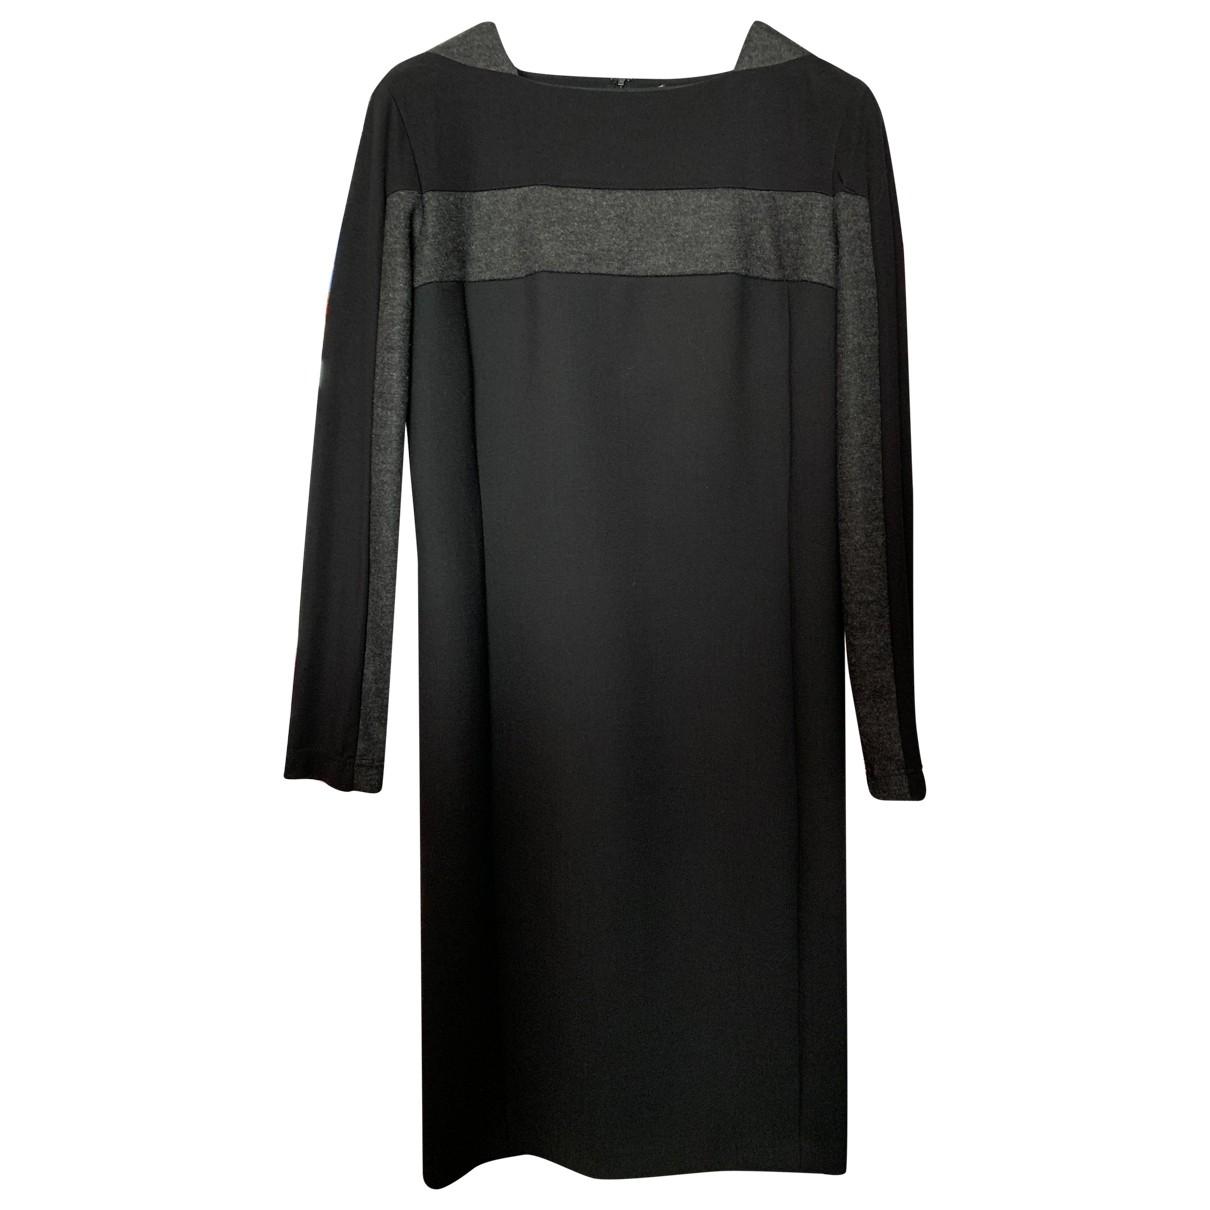 Intrend \N Black Cotton - elasthane dress for Women S International